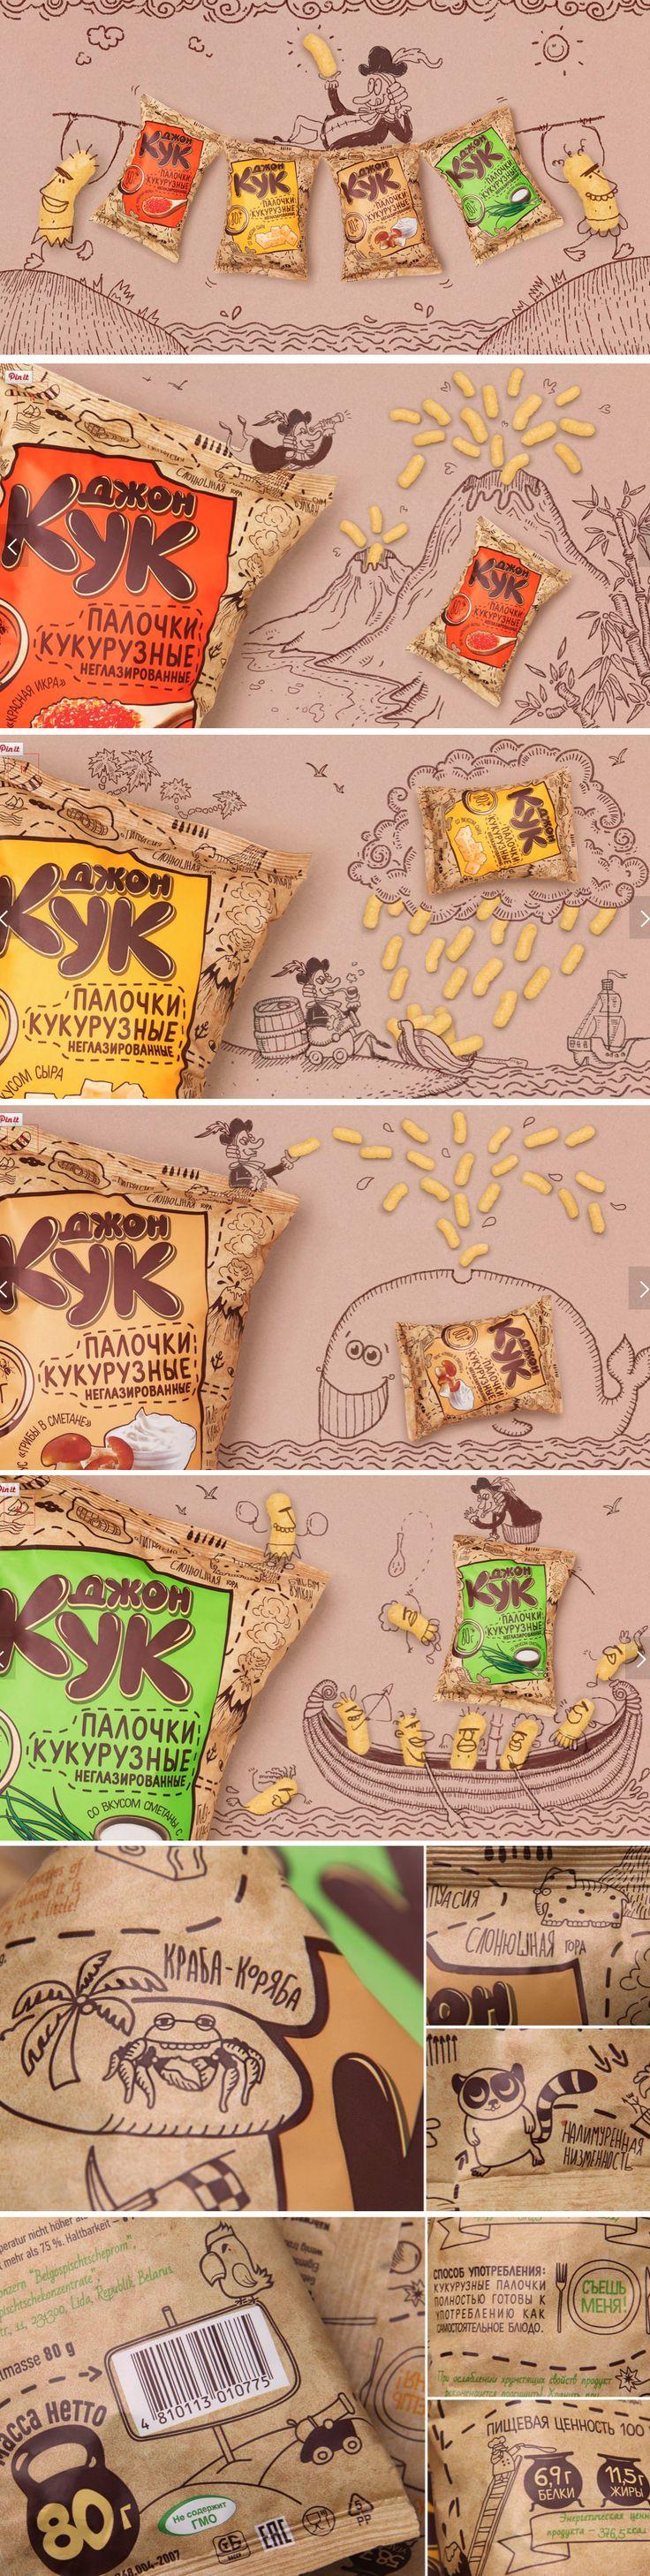 John Kook corn snacks